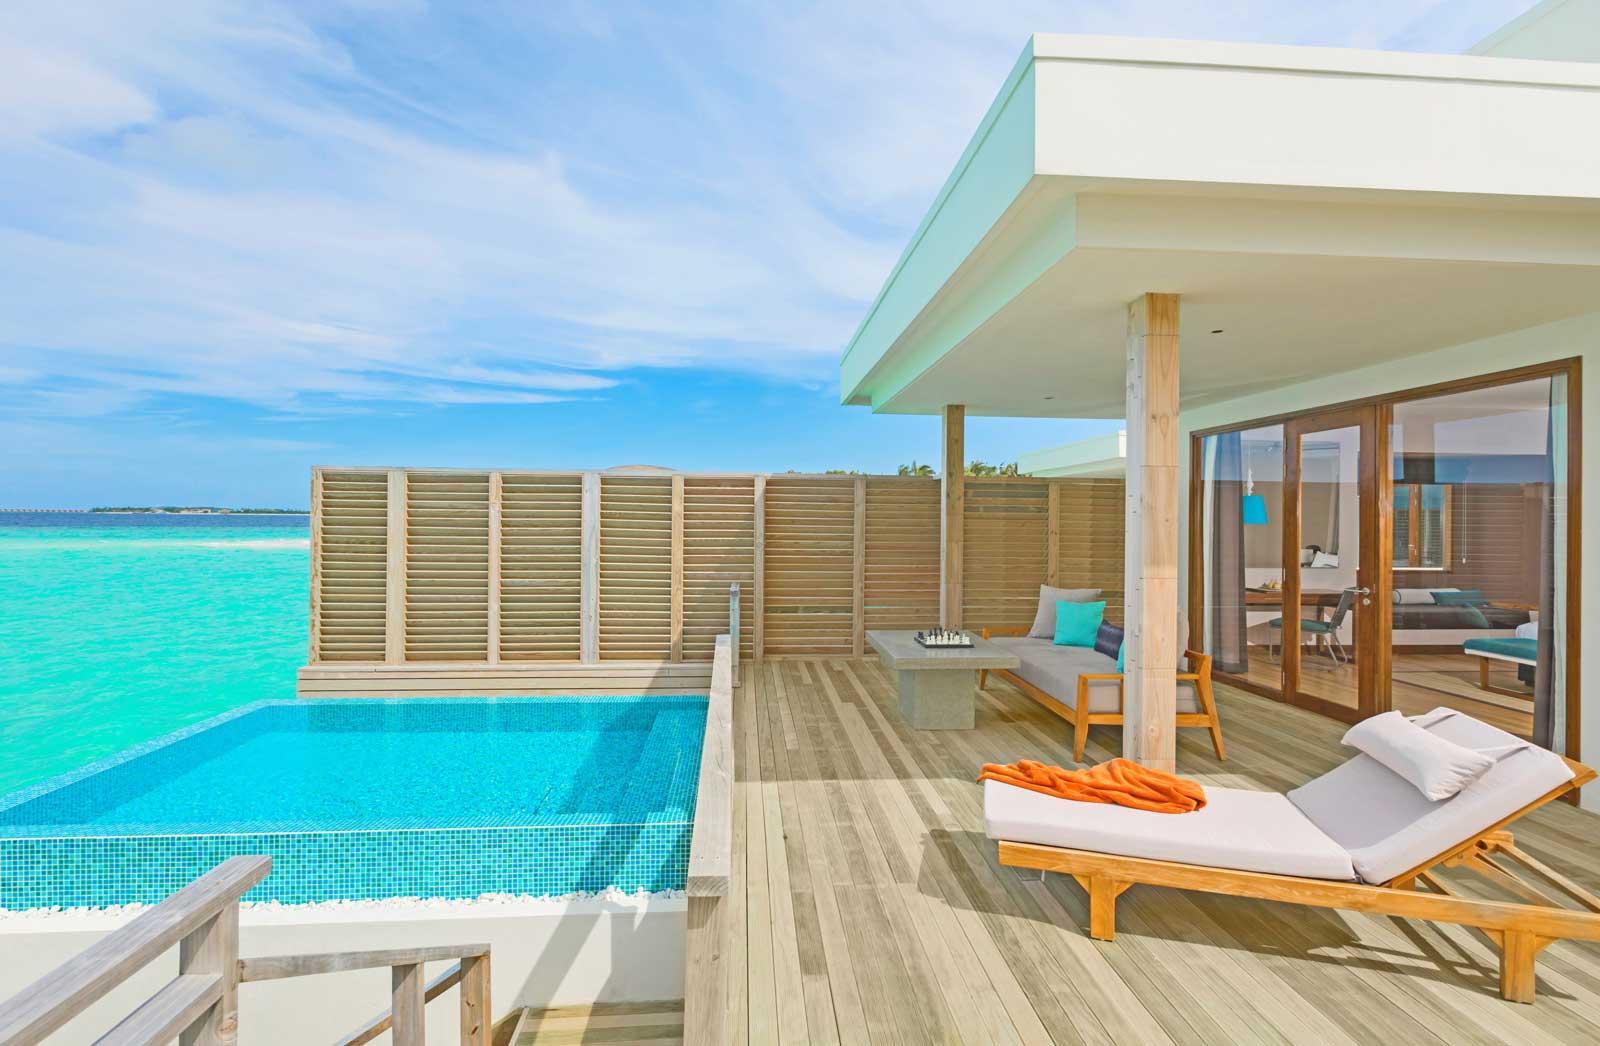 dhigali lagoon villa with pool 2